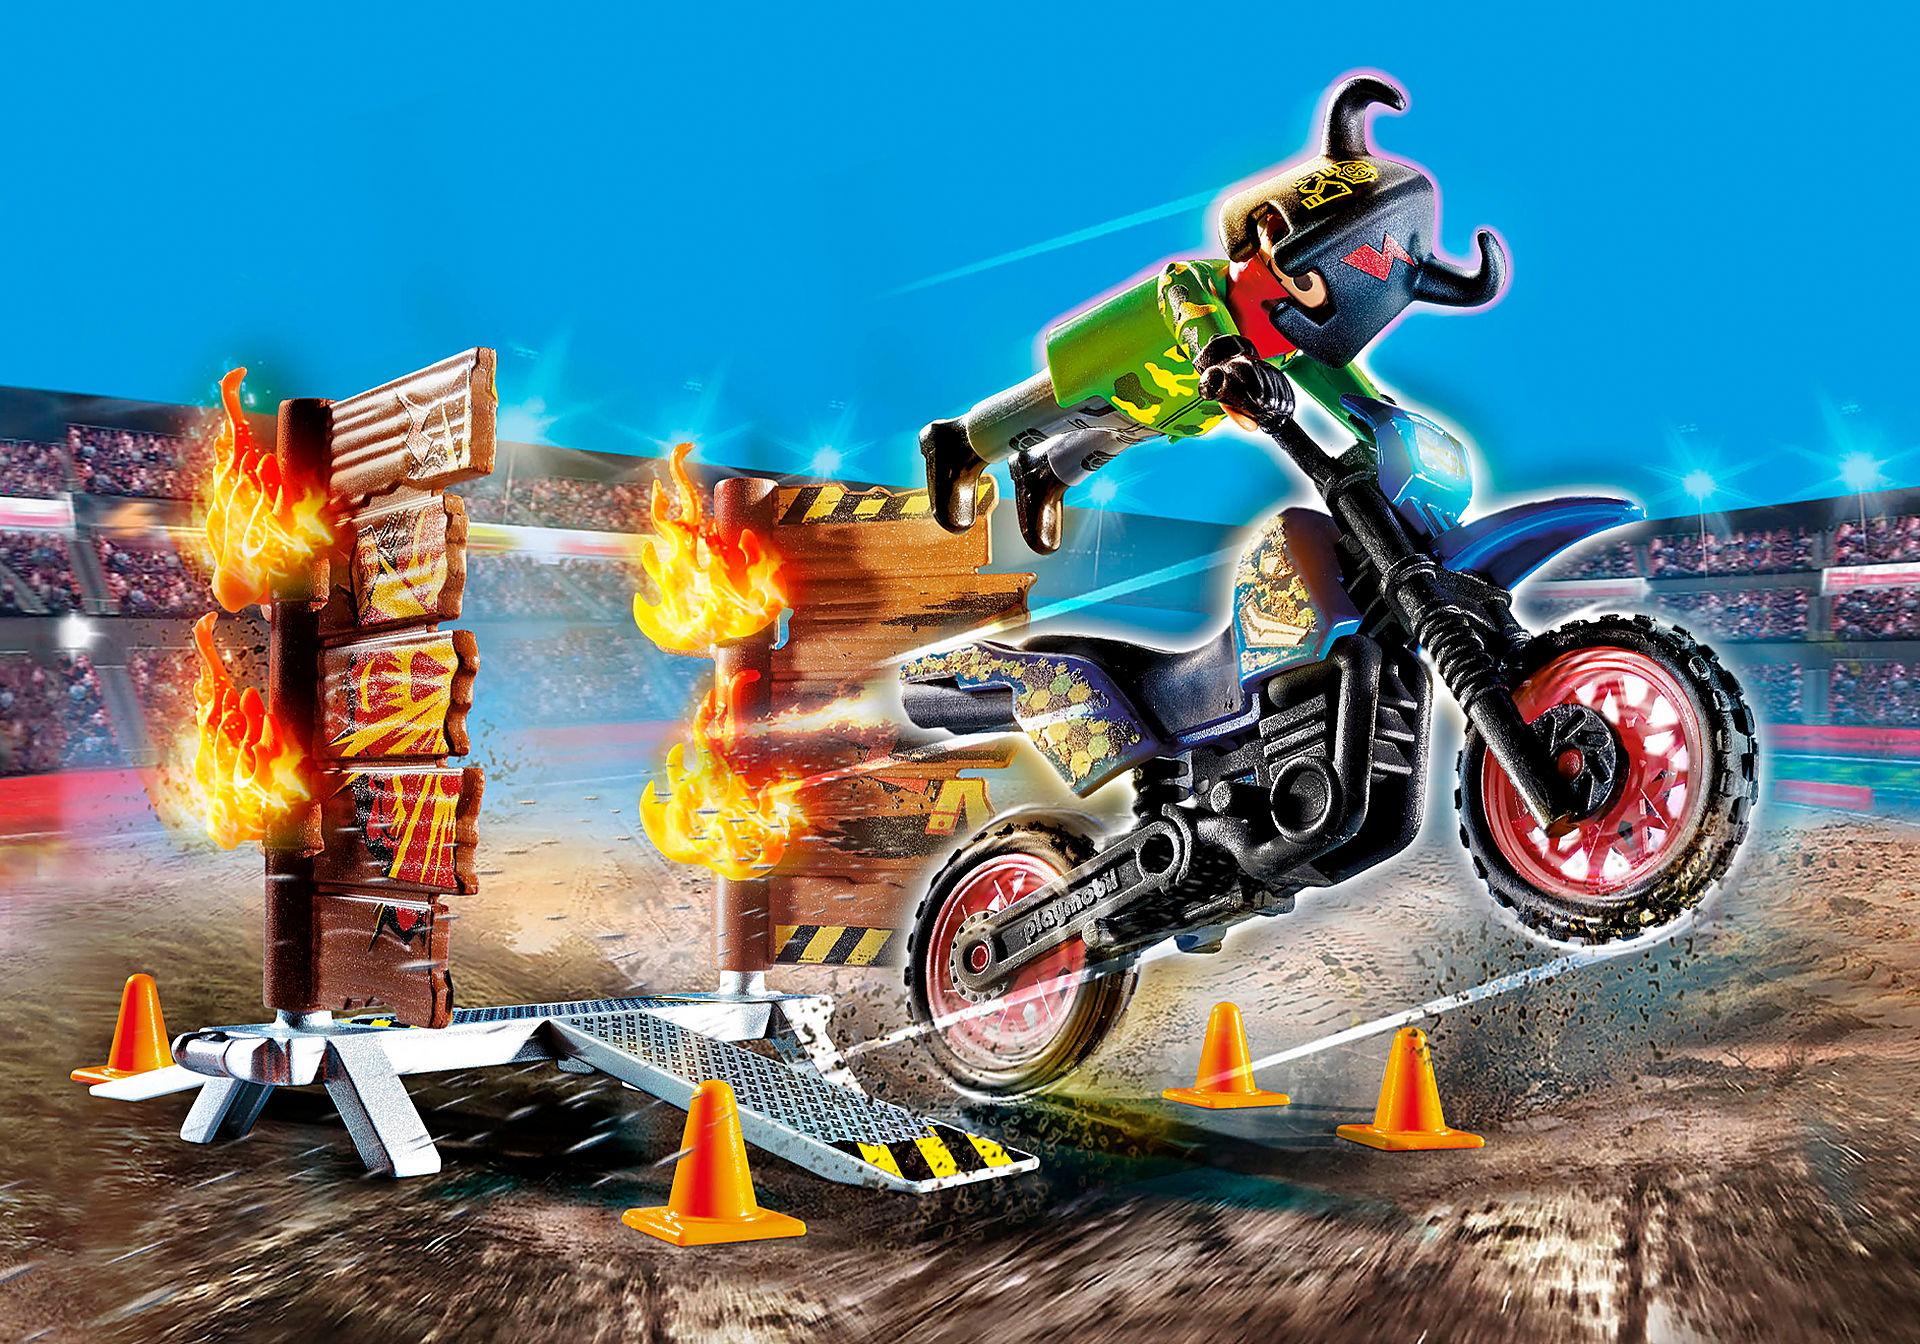 70553 Stuntshow Pilote de moto et mur de feu zoom image1